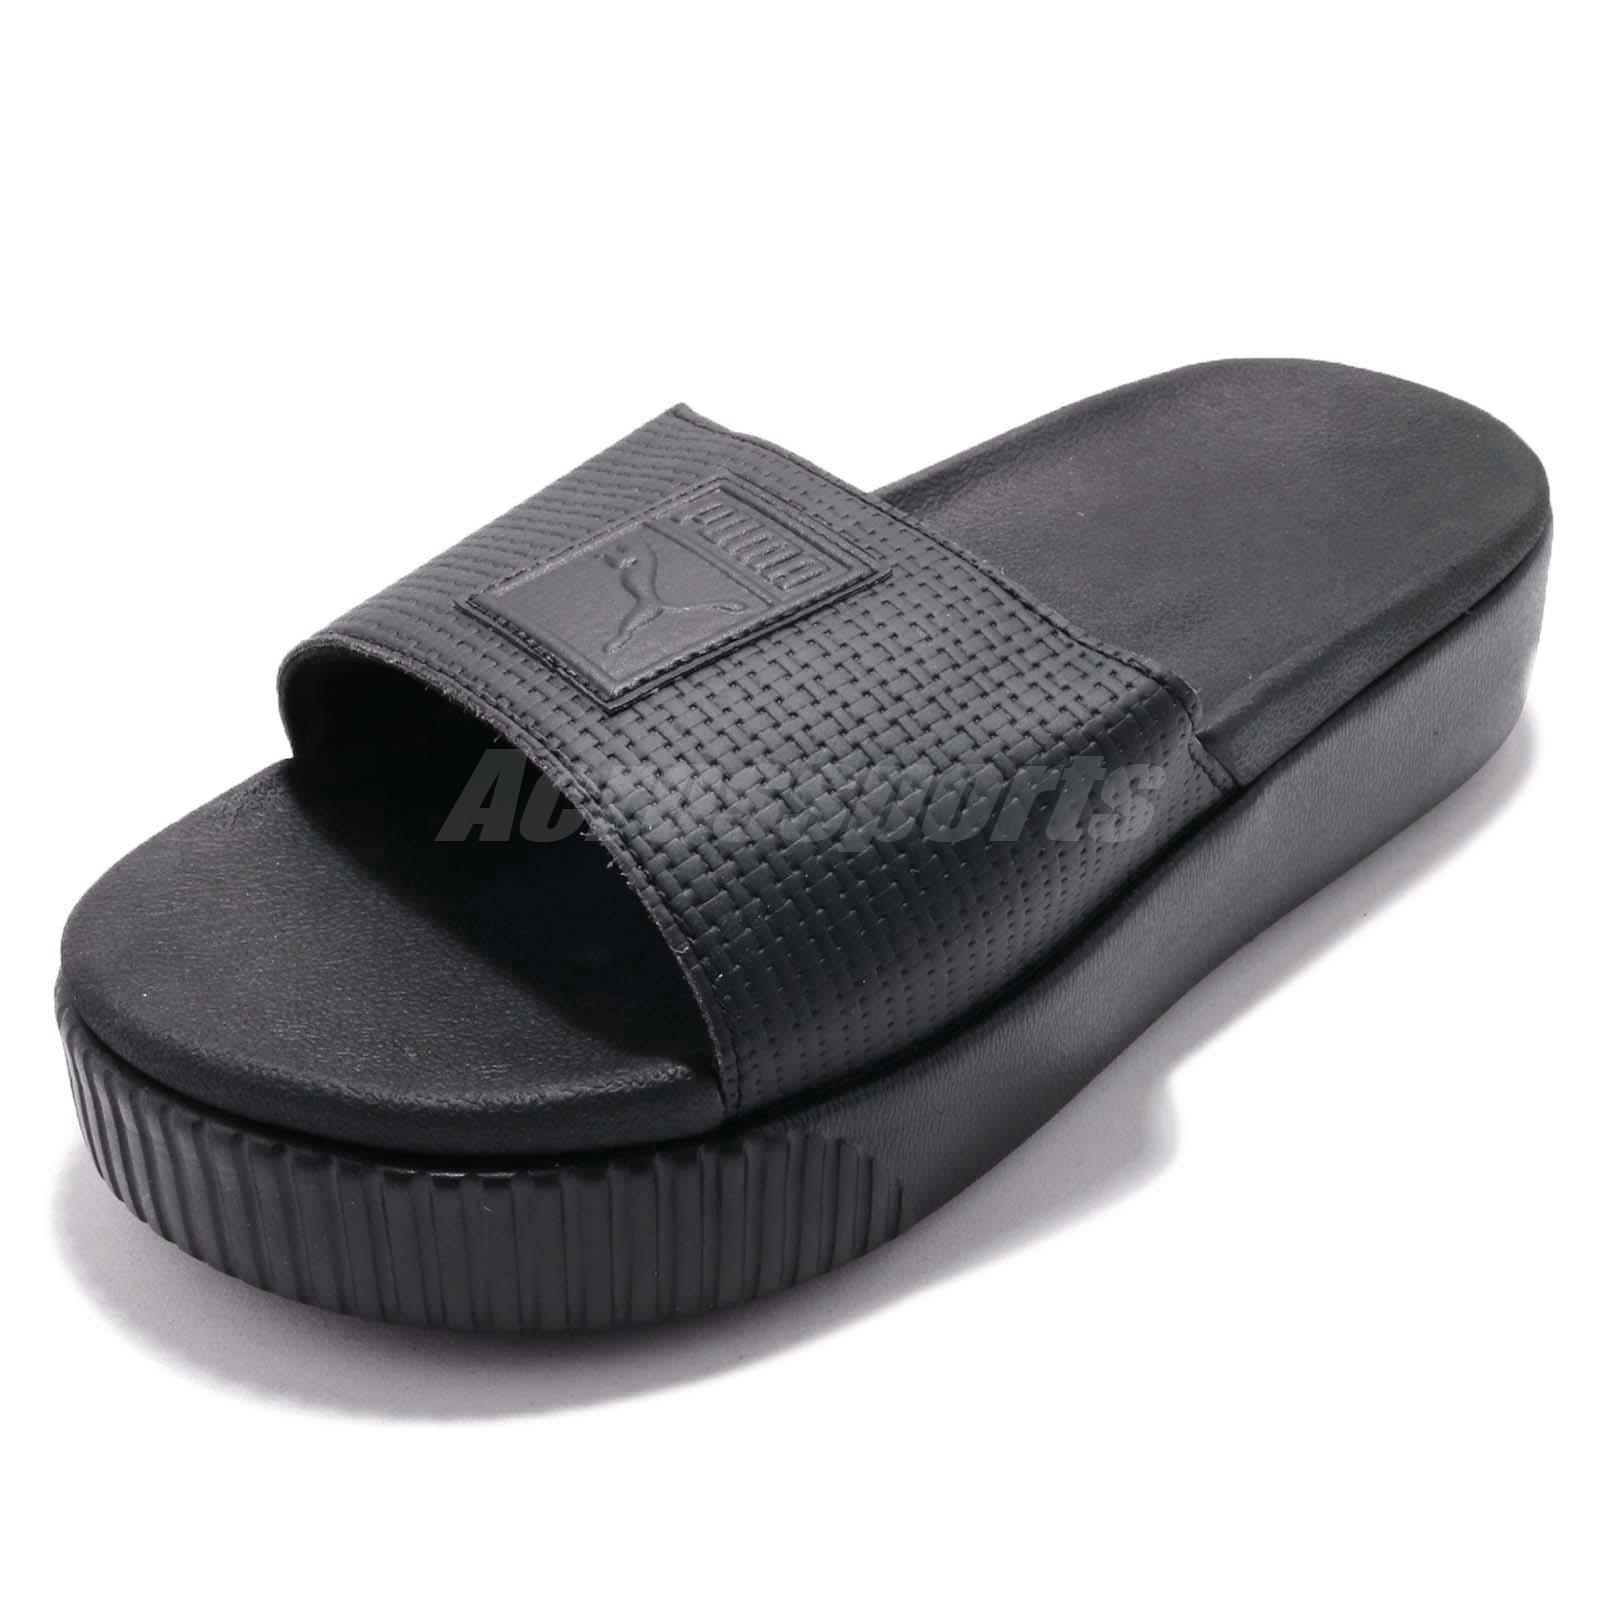 6b706d16b784 Puma Platform Slide Wns EP Strap Triple Black Women Sandal Slippers  366122-02